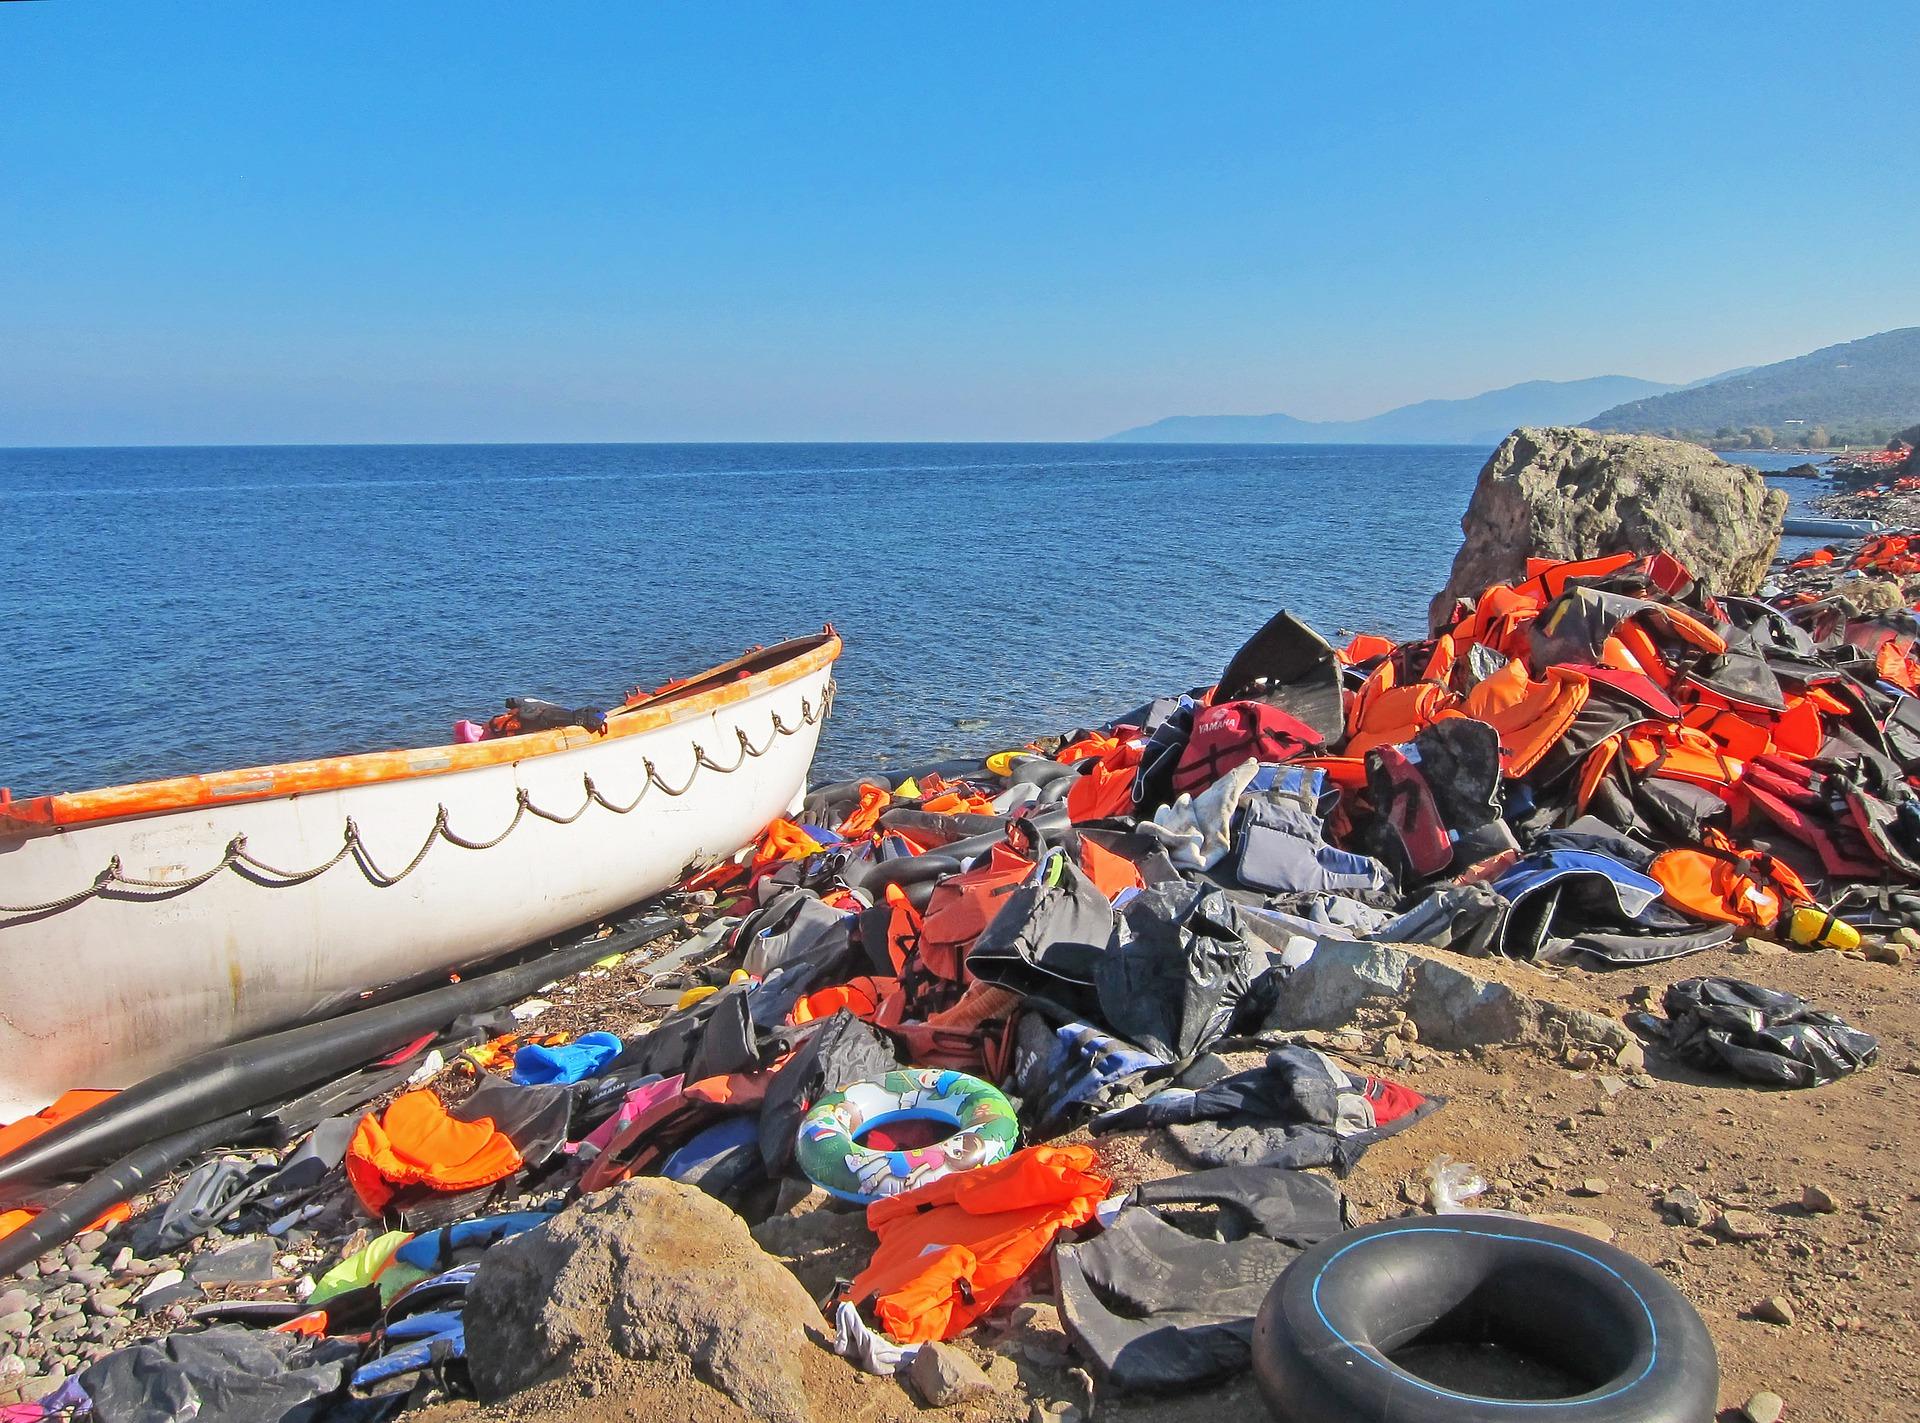 refugees-4682826_1920